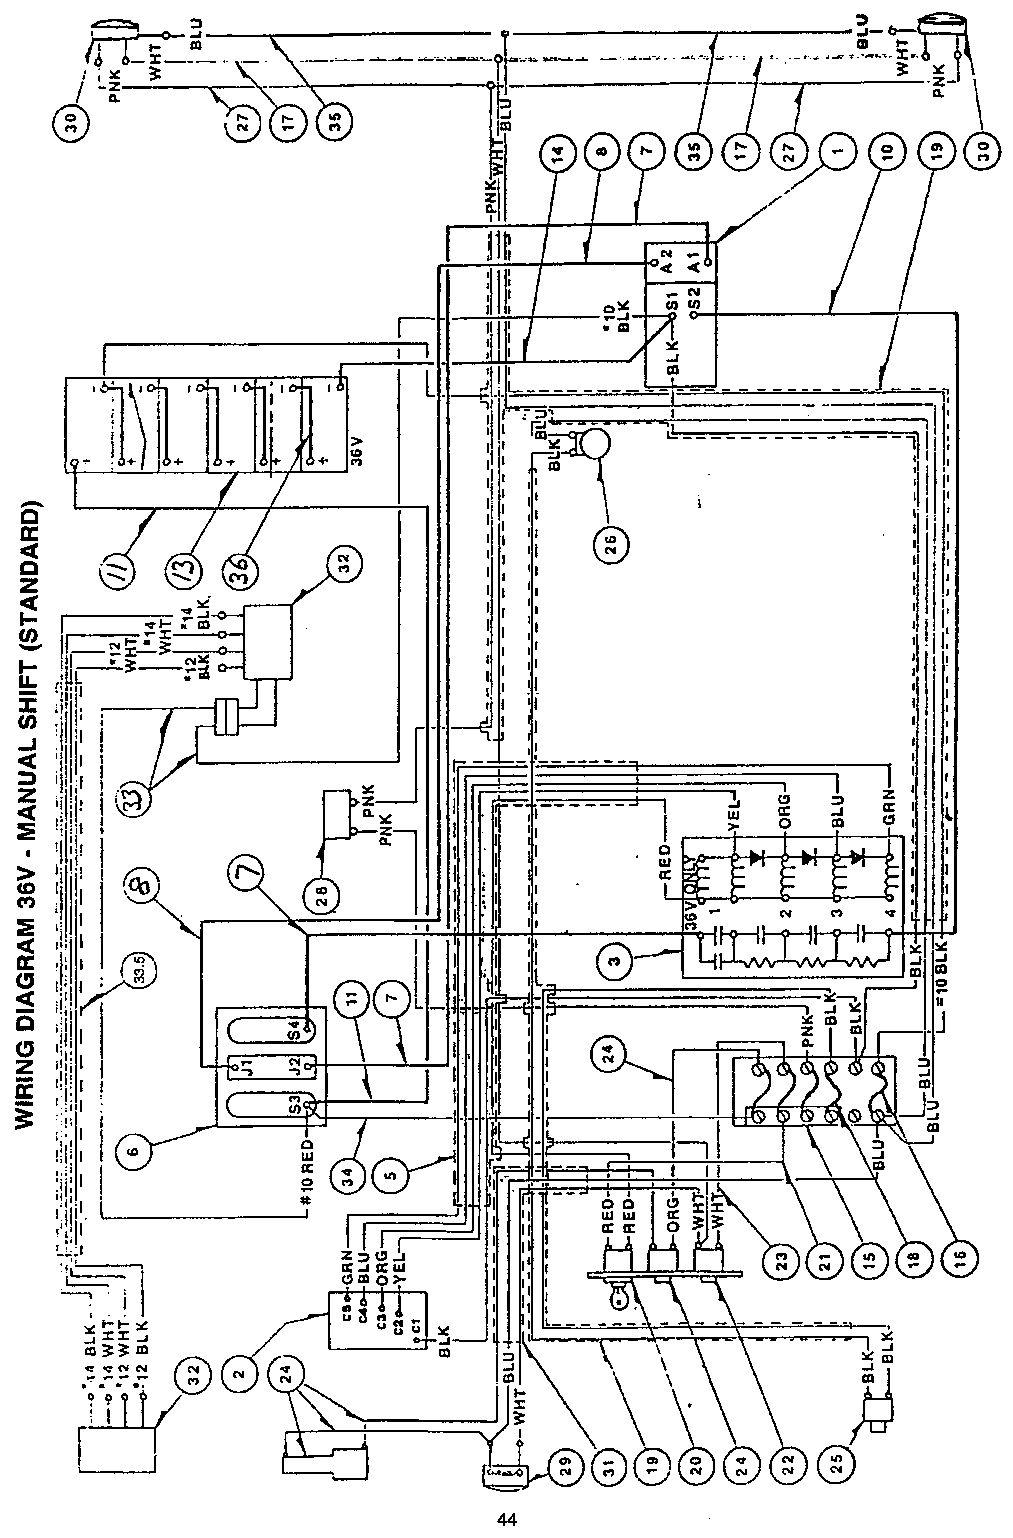 2003 saturn l200 fuse box diagram  saturn  auto fuse box